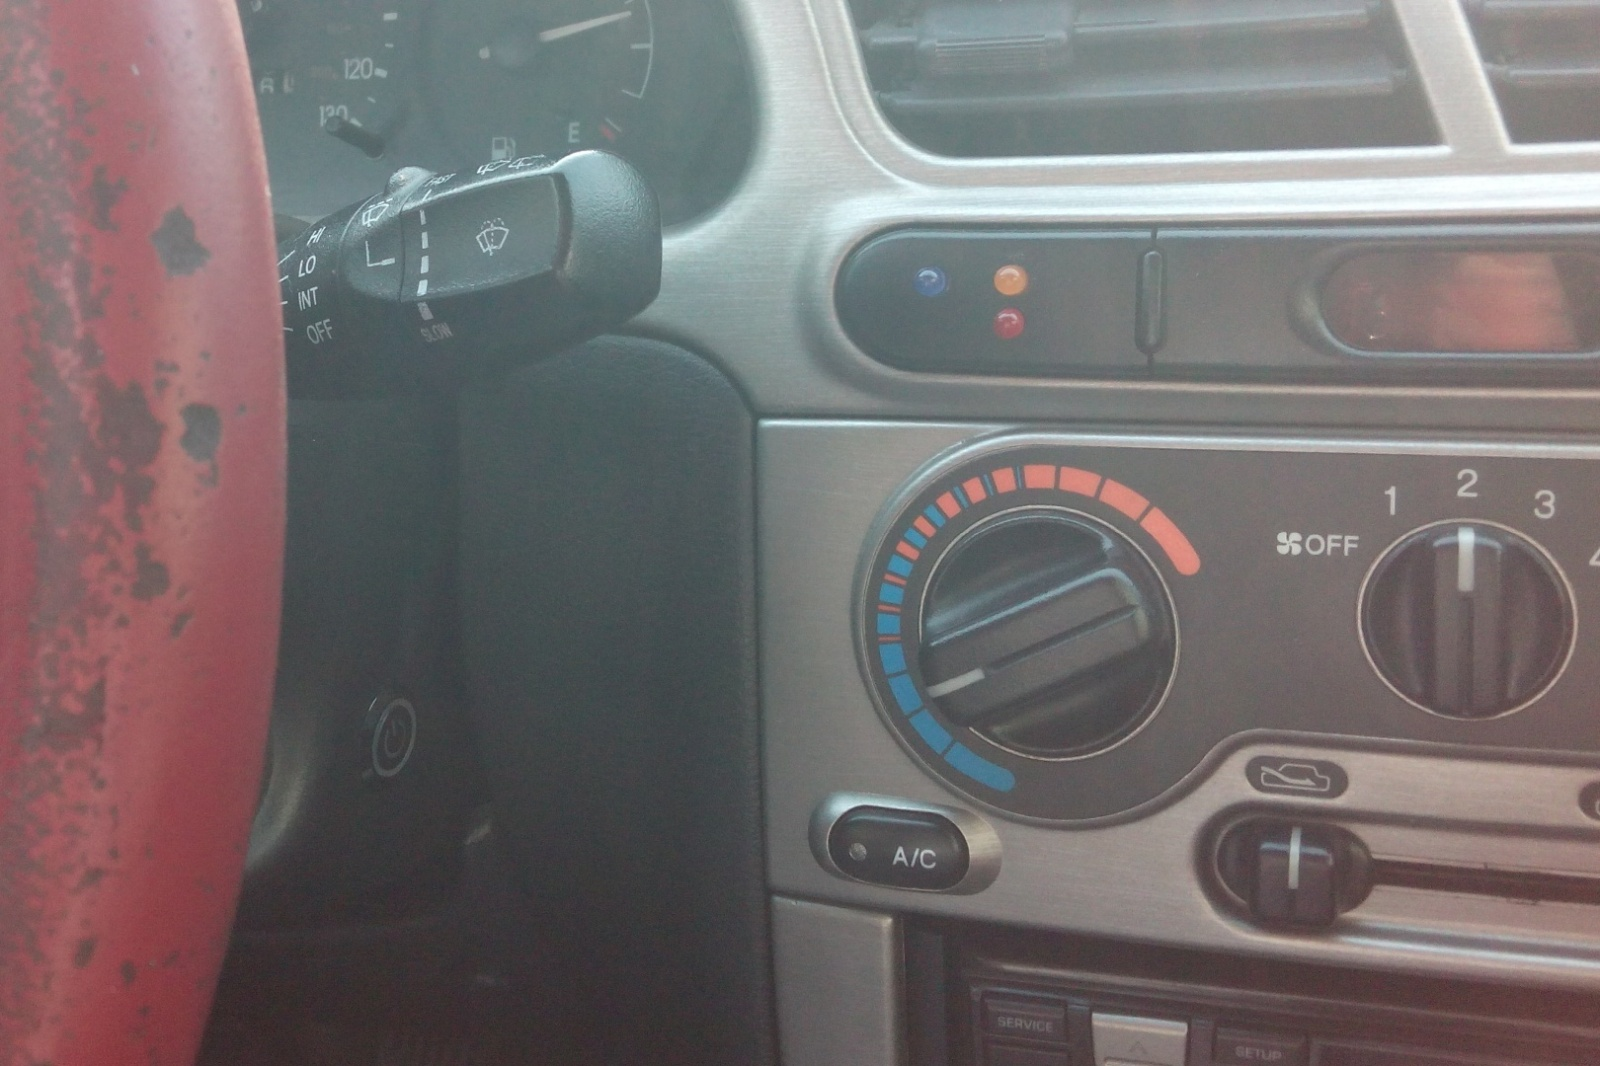 Секс в автомобиле или ещё одна кнопка старт-стоп с ардуино и светодиодами - 21